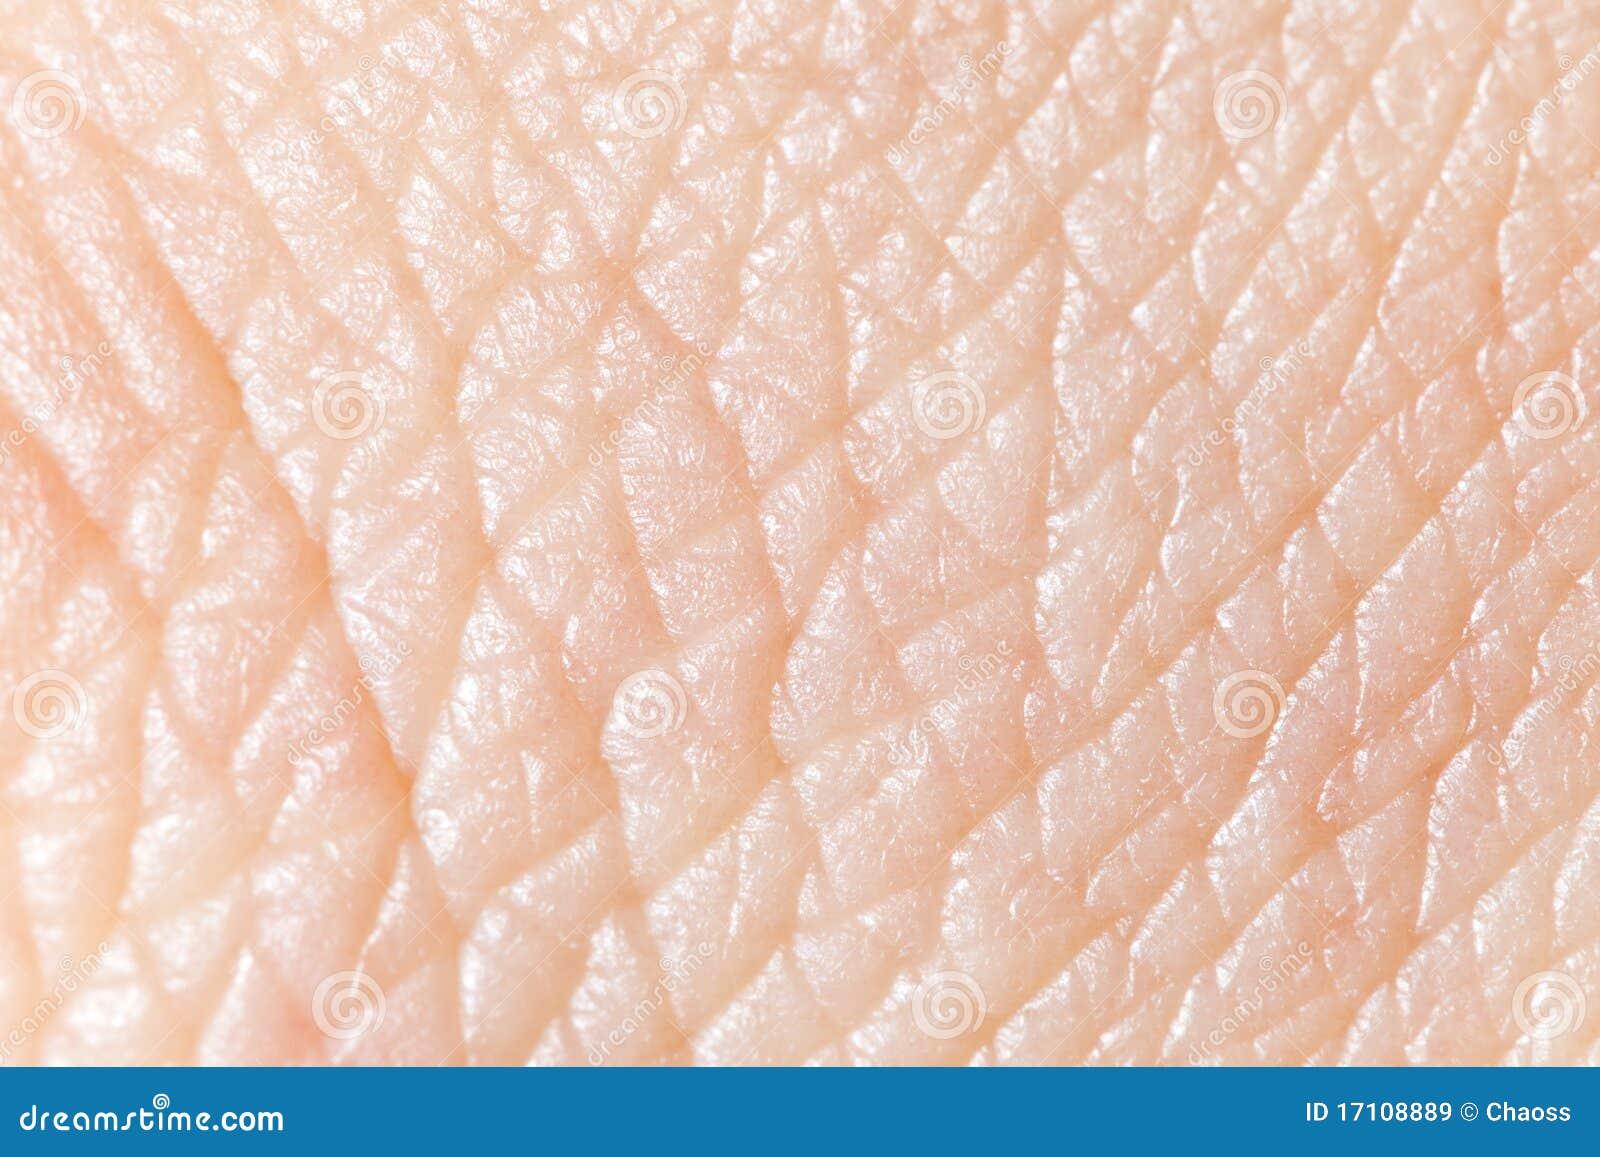 human skin royalty free stock images image 17108889 human skin royalty free stock images image 17108889